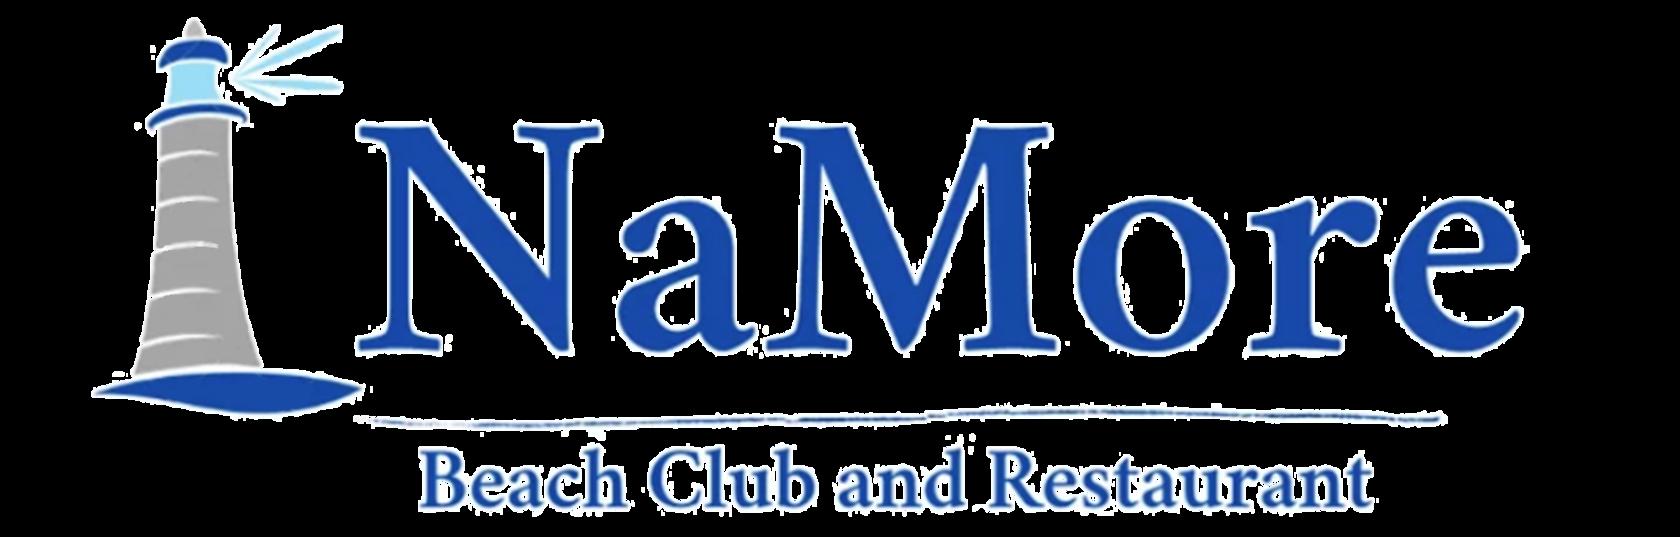 NaMore beach club and restaurant - ресторанный комплекс на берегу Финского залива